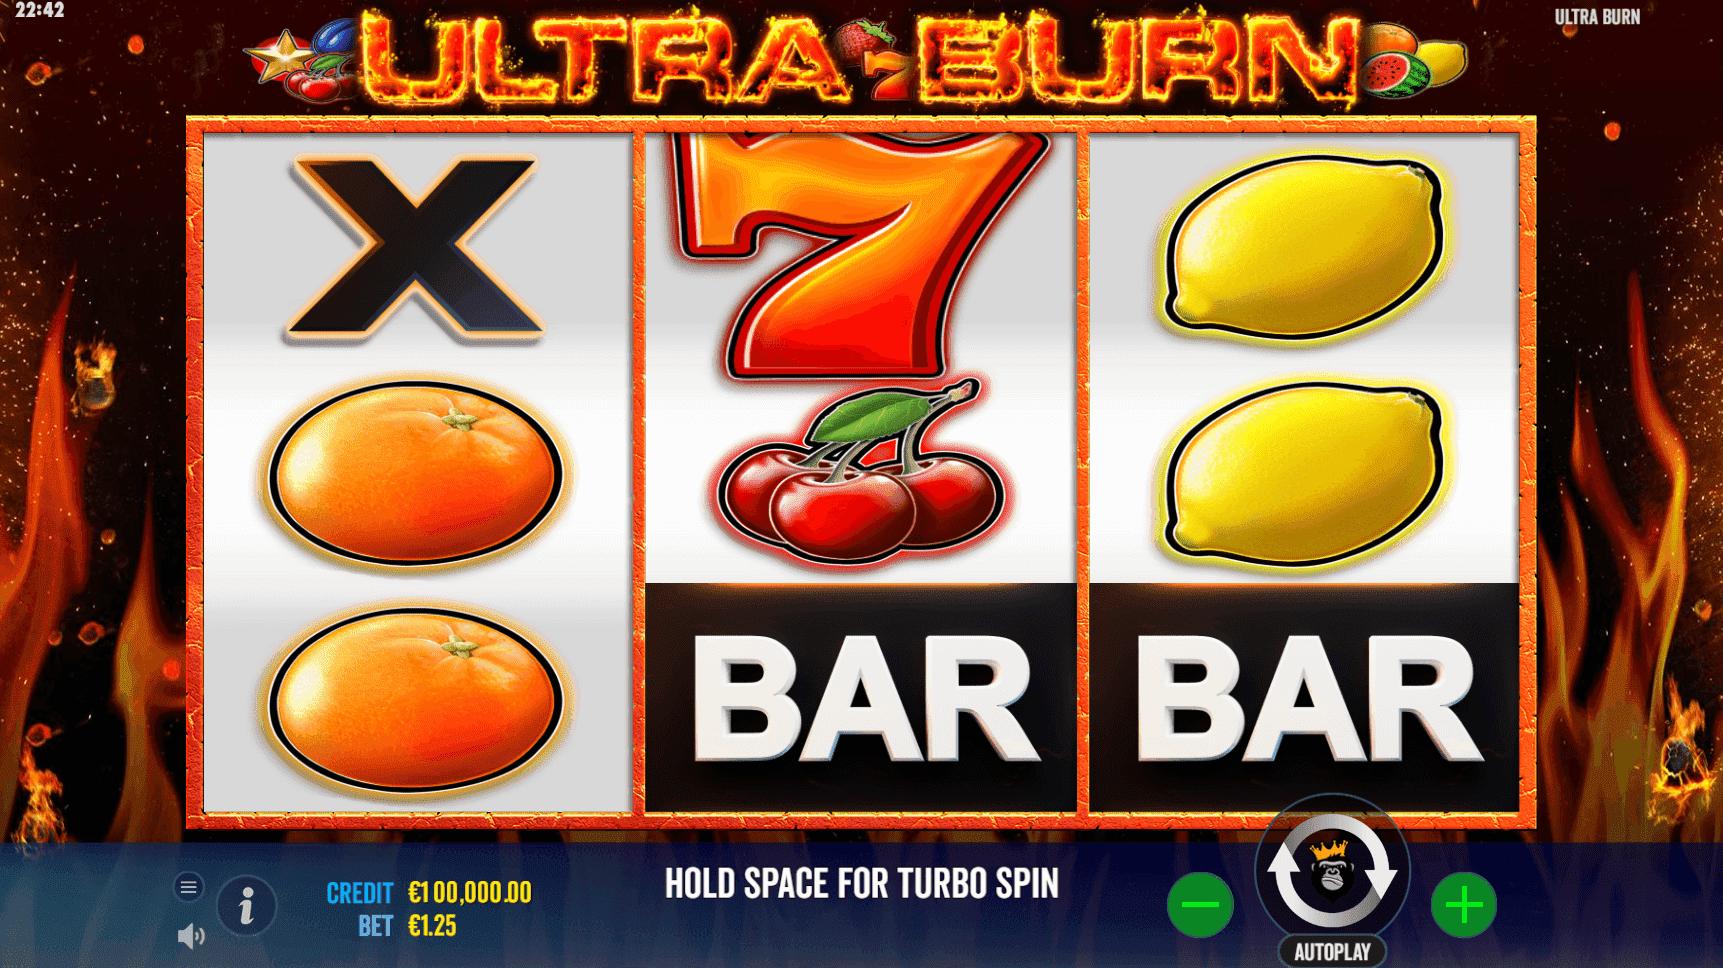 Ultra Burn slot machine screenshot